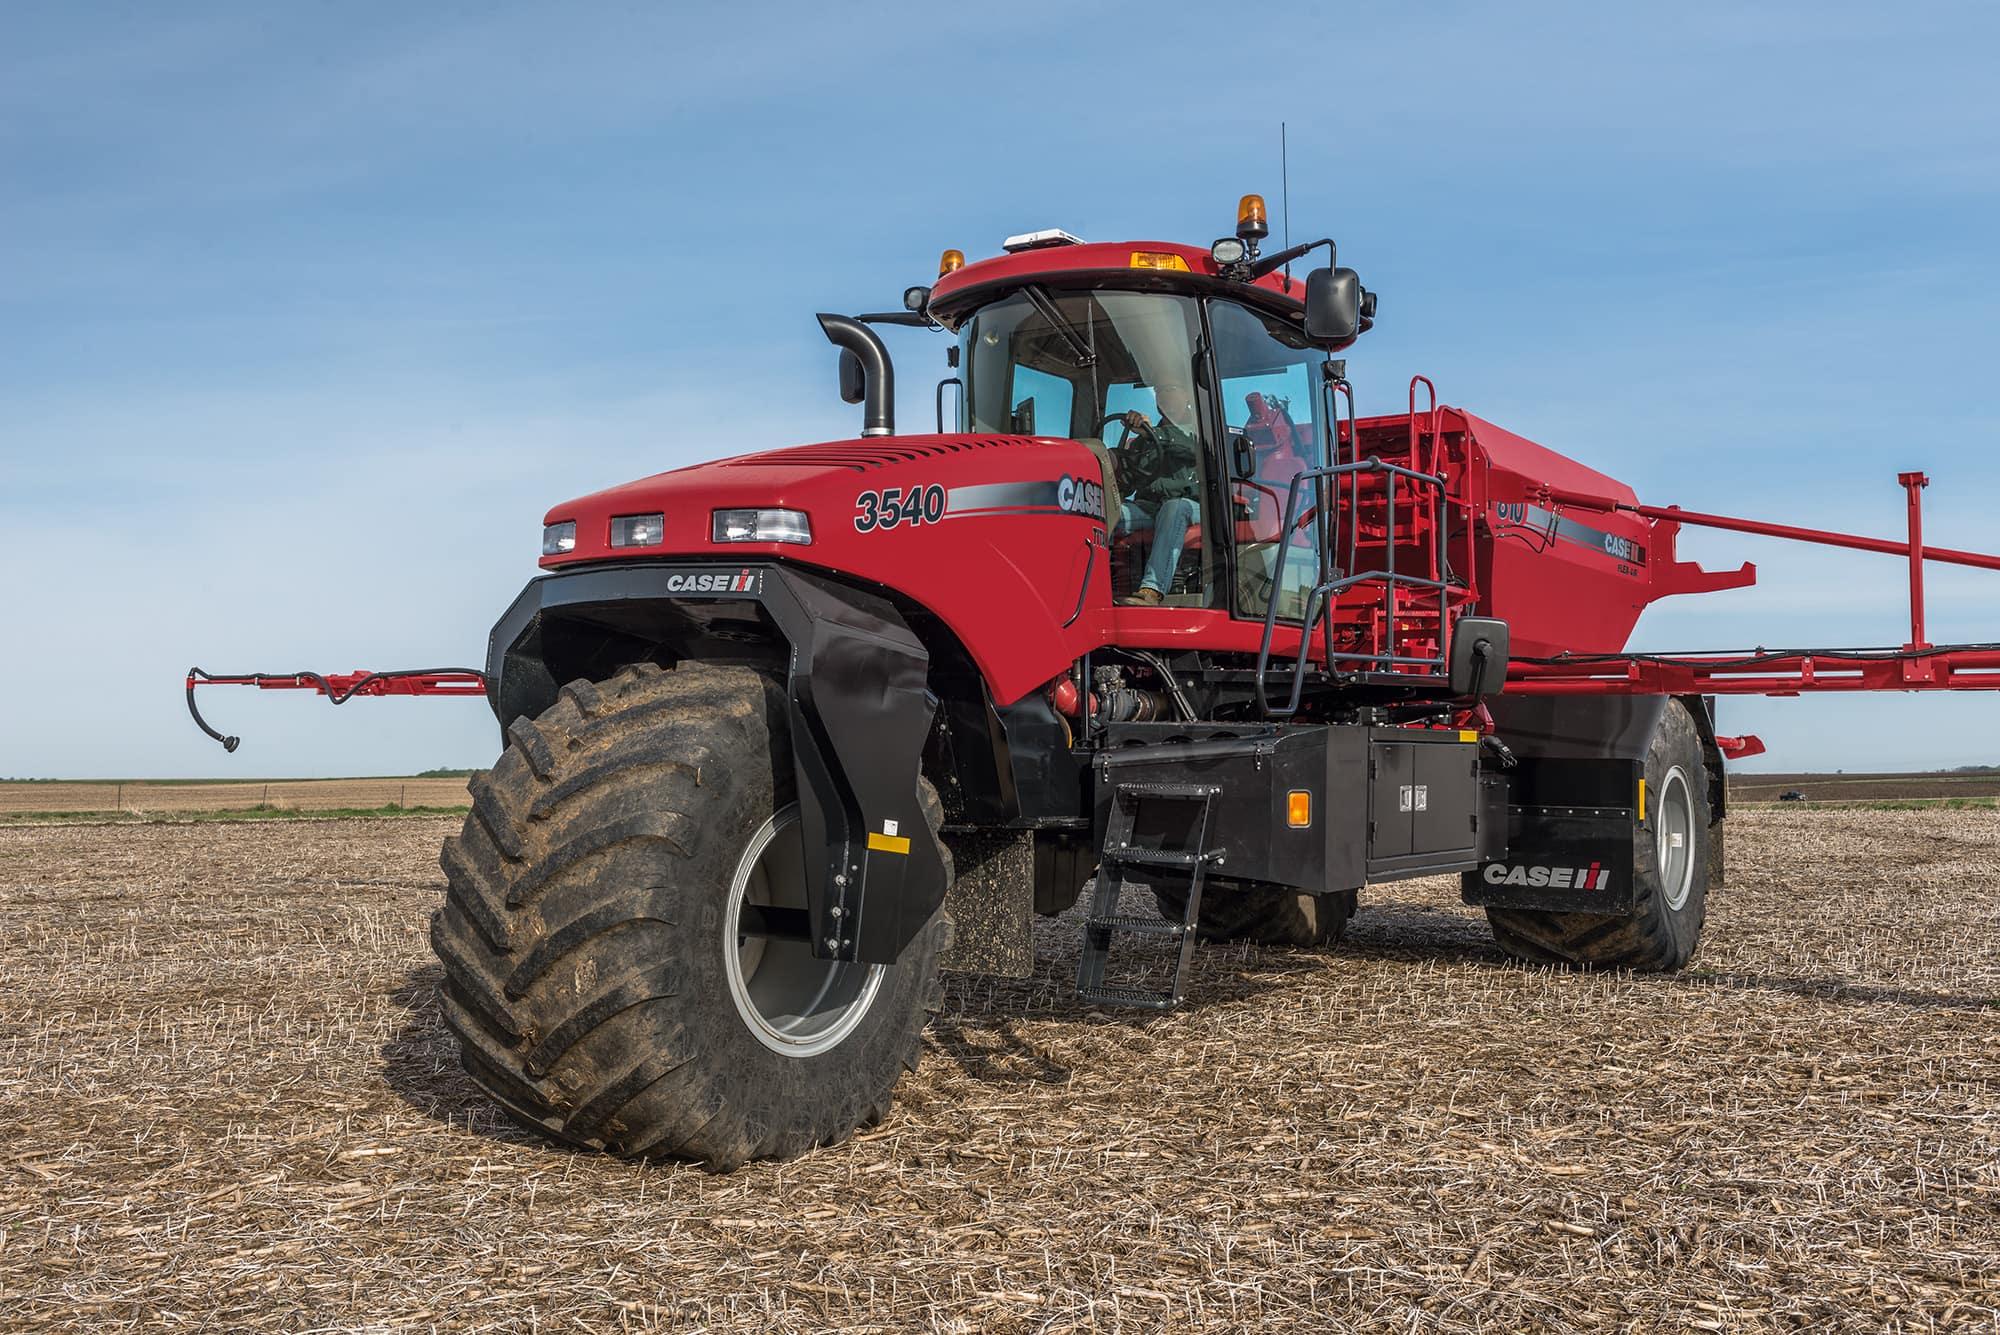 medium resolution of  tractor 3540 titan floater 05 14 0770 width 437 height 292 farmtrac 60 wiring diagram